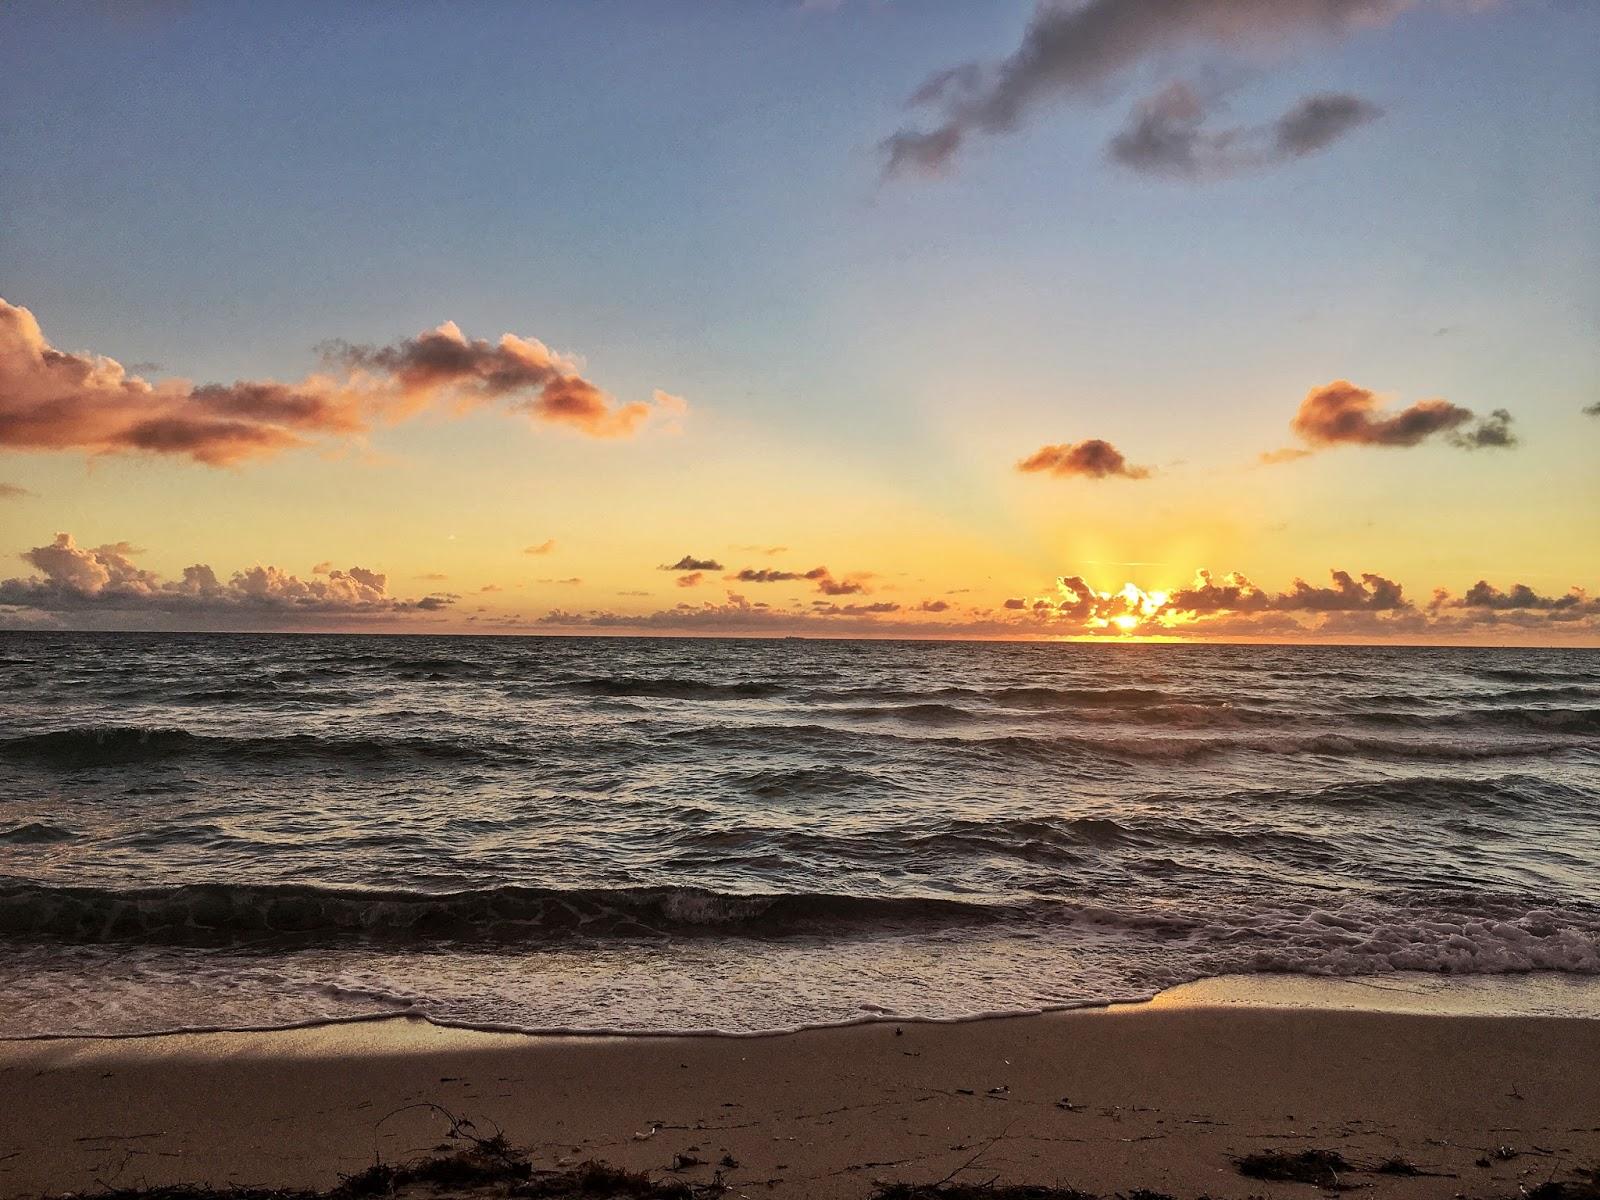 Miami, Florida, ejnets